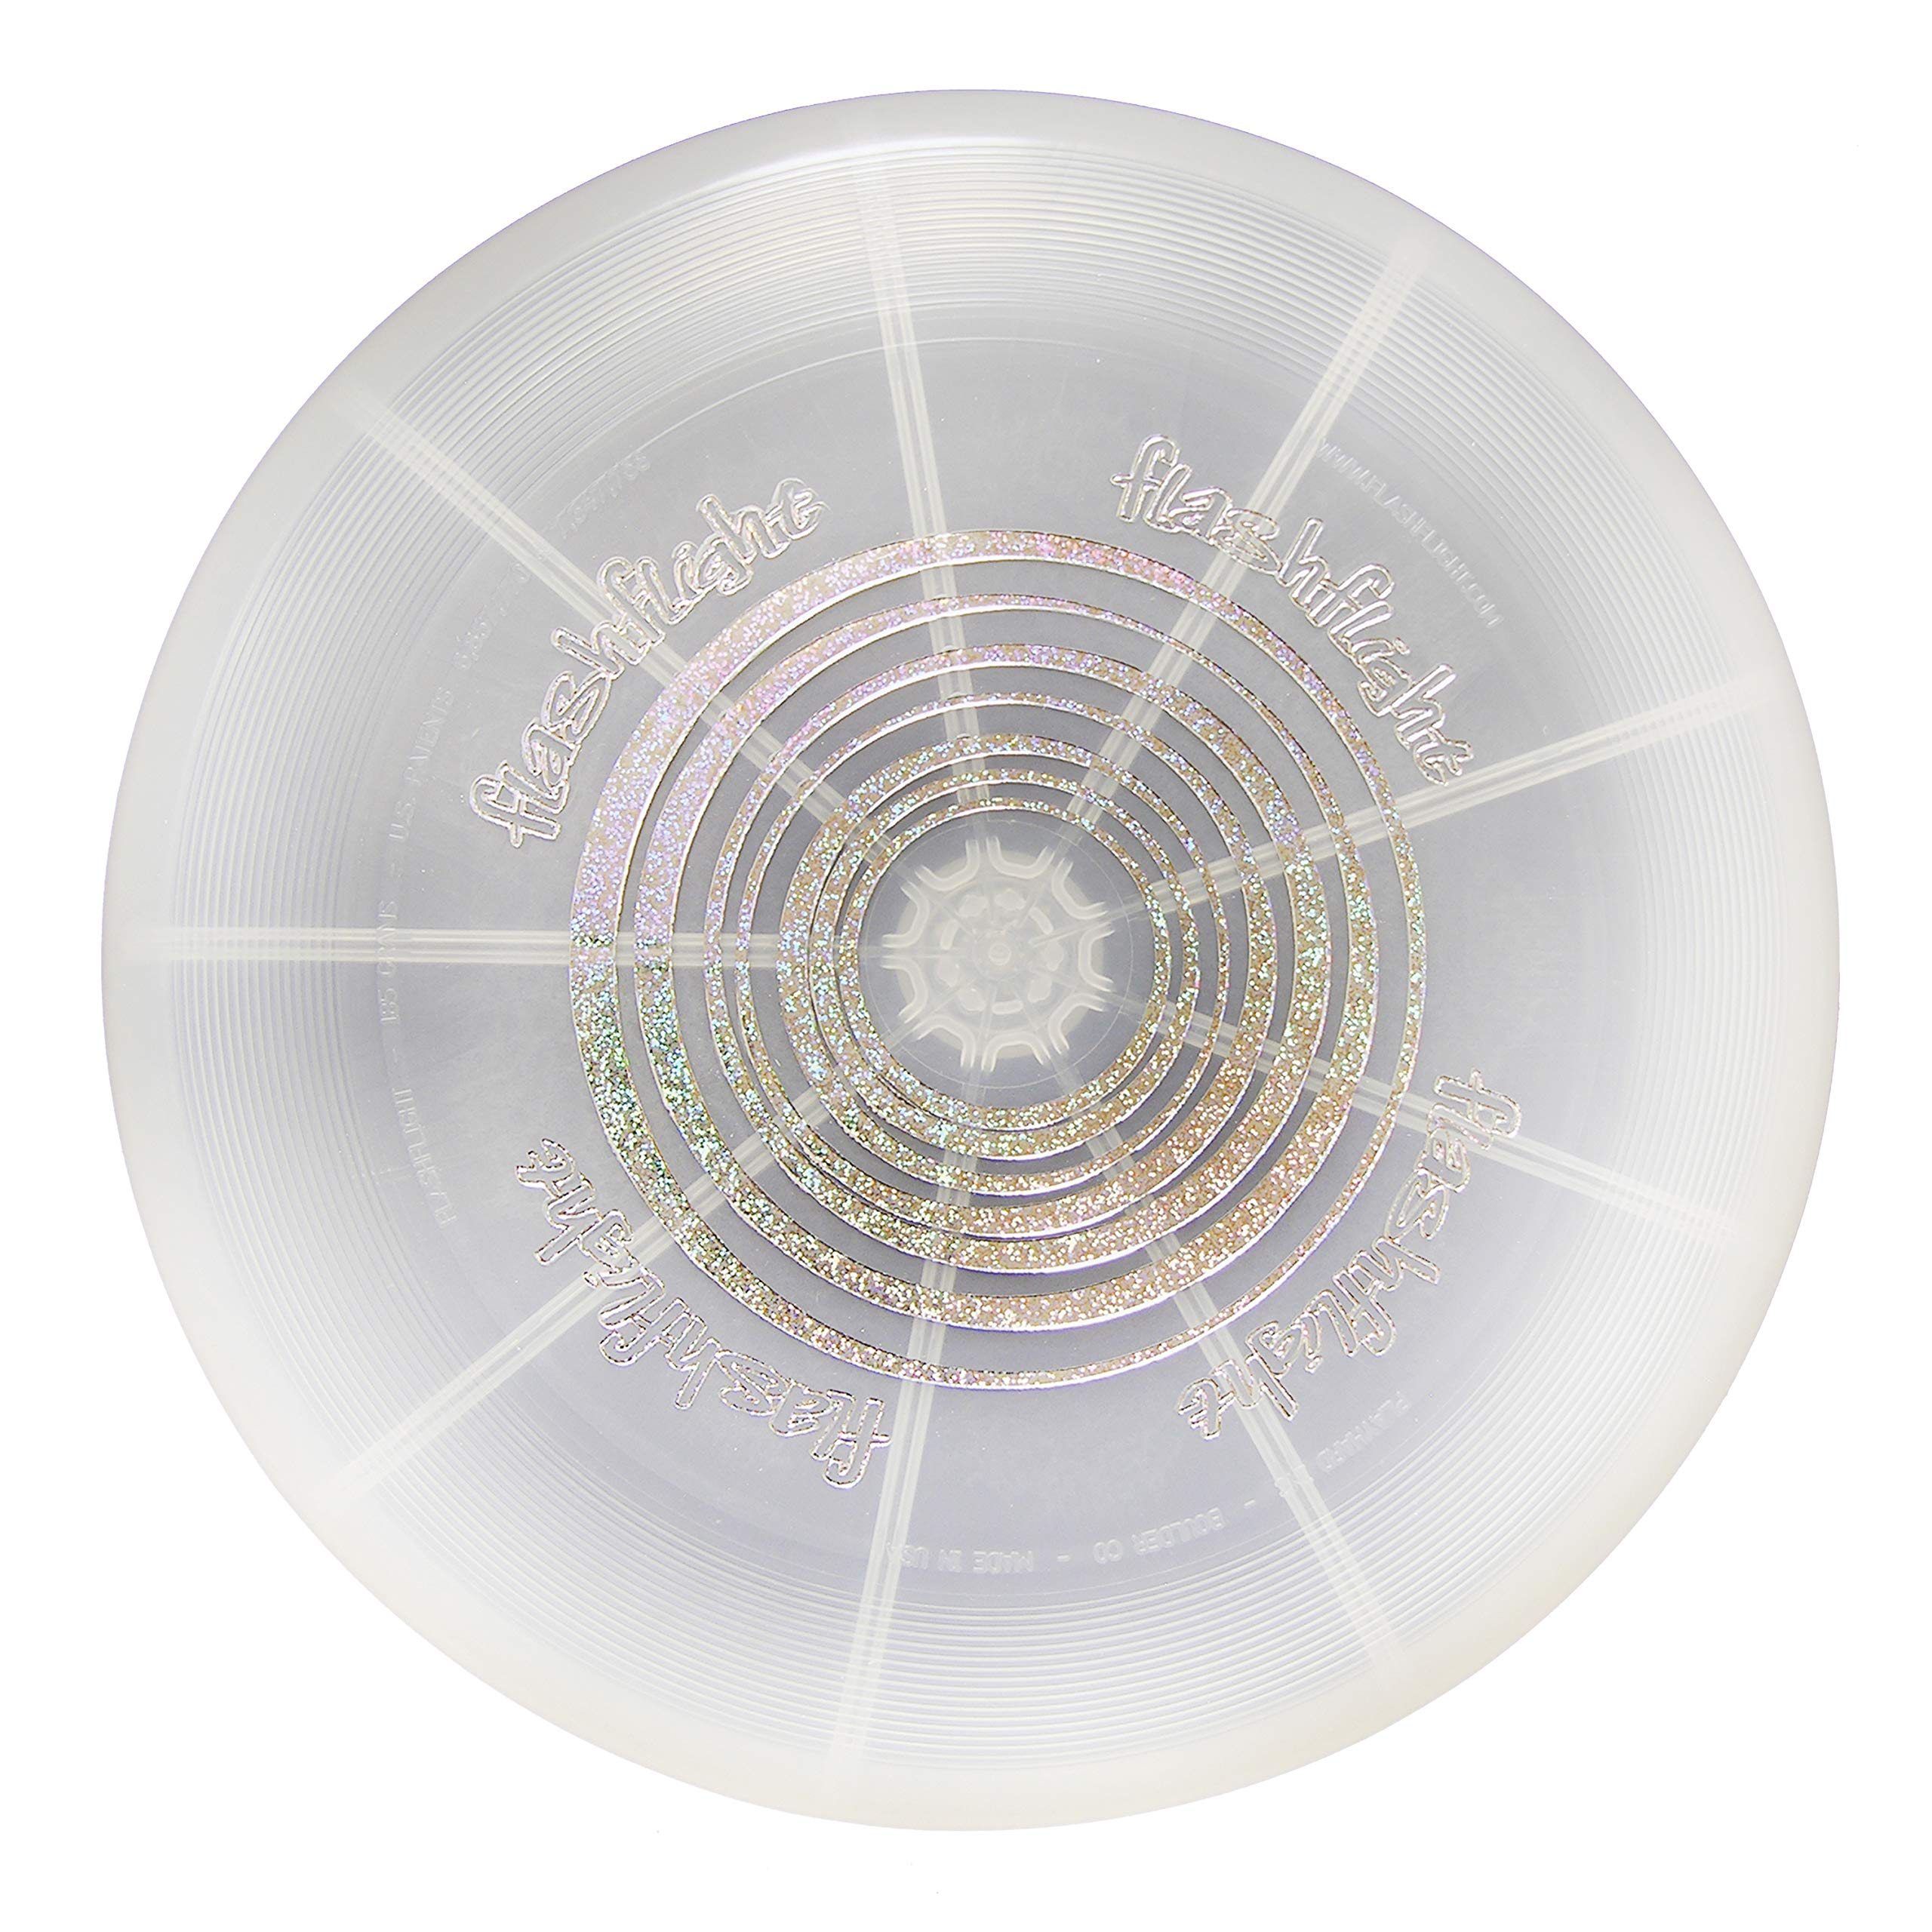 Nite Ize Flashflight LED Flying Disc, Light up the Dark for Night Games, 185g,  Disc-O by Nite Ize